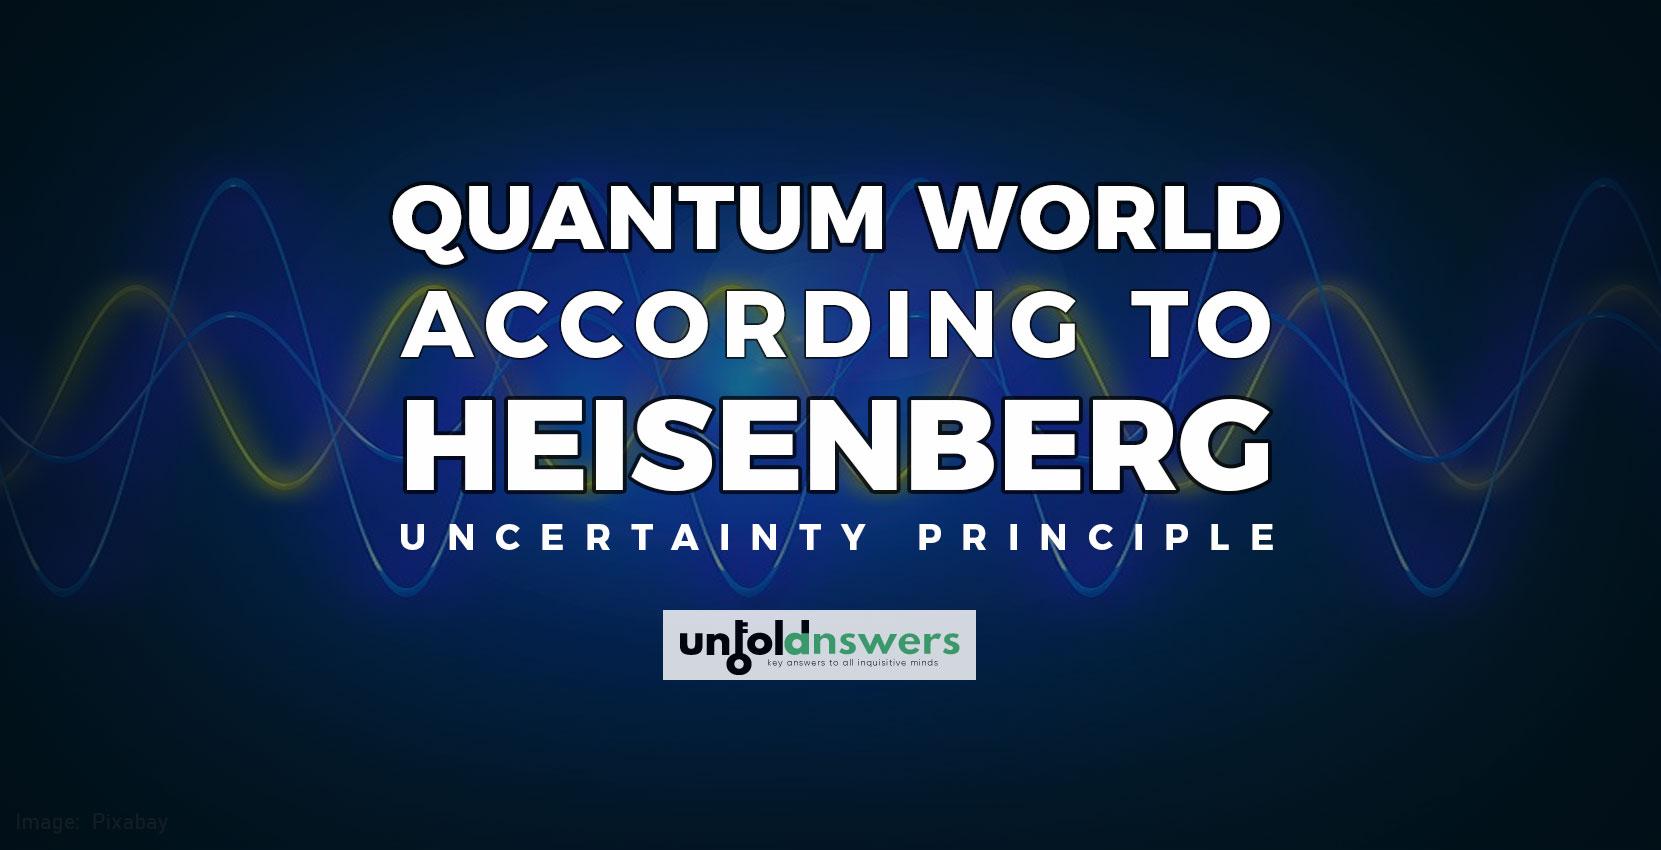 Quantum World According to Heisenberg Uncertainty Principle